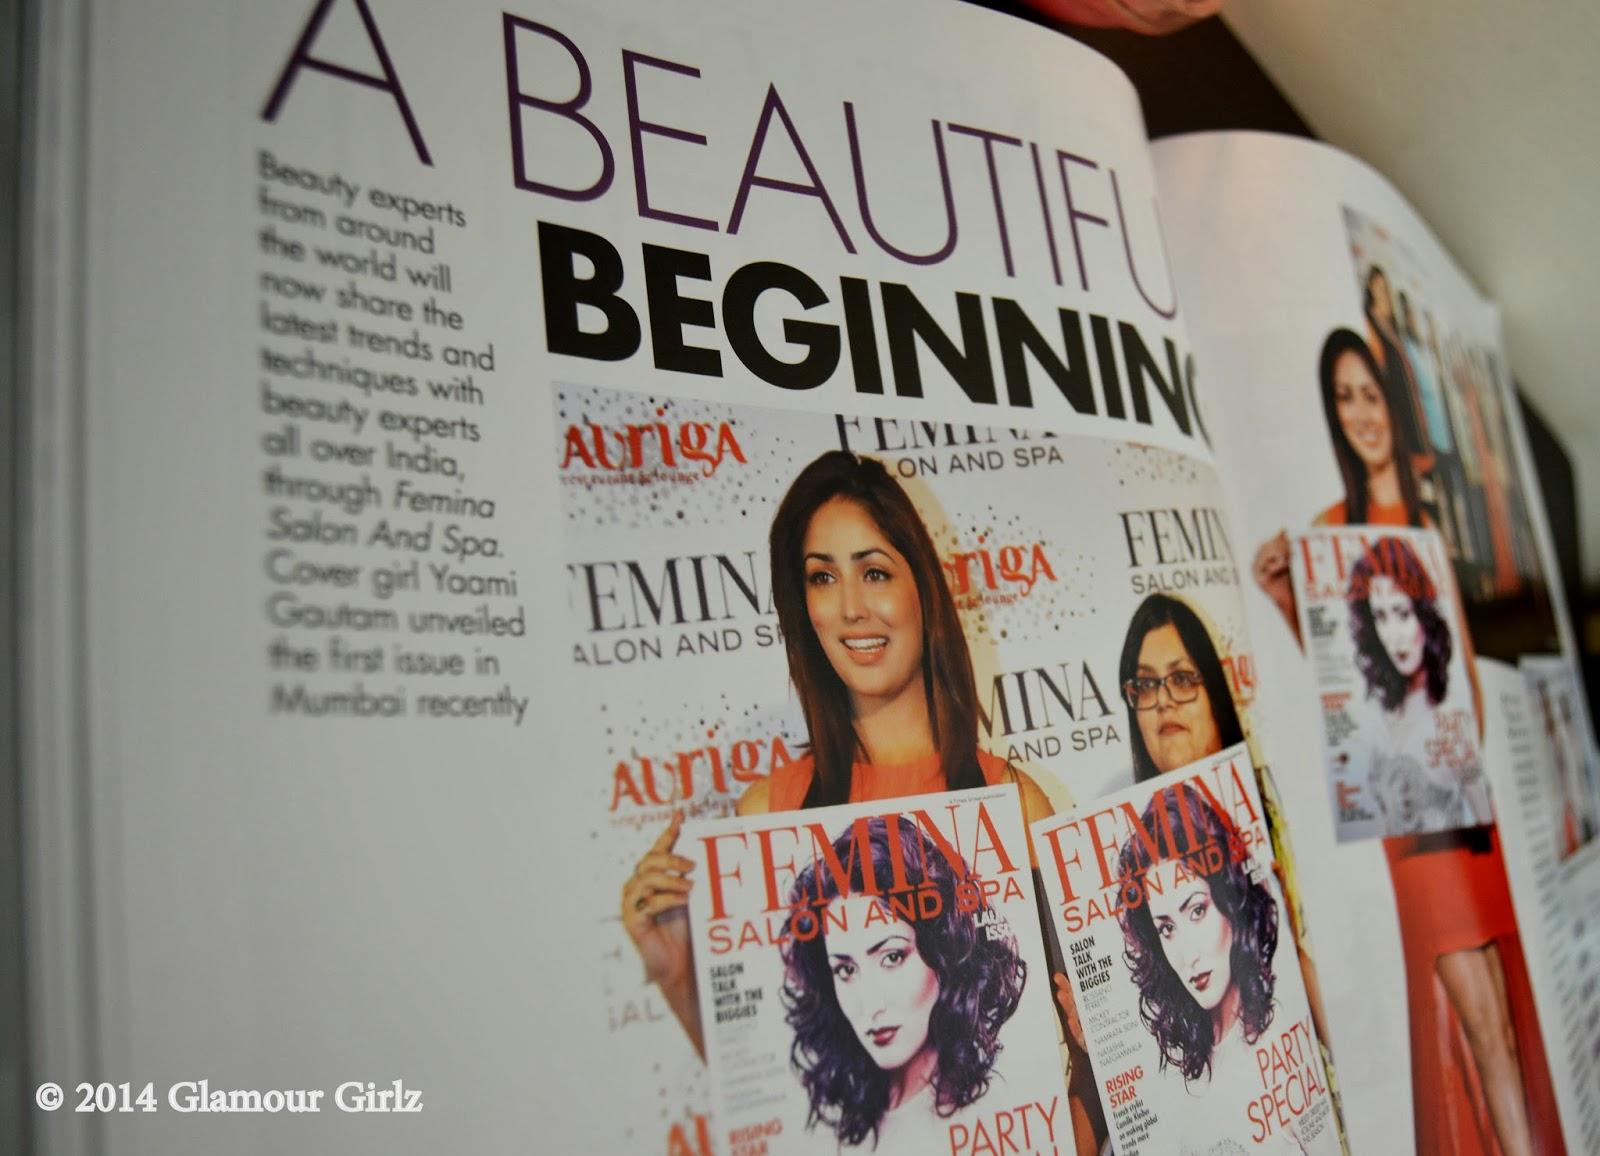 Yami Gautam, Femina Salon & Spa in December 2013